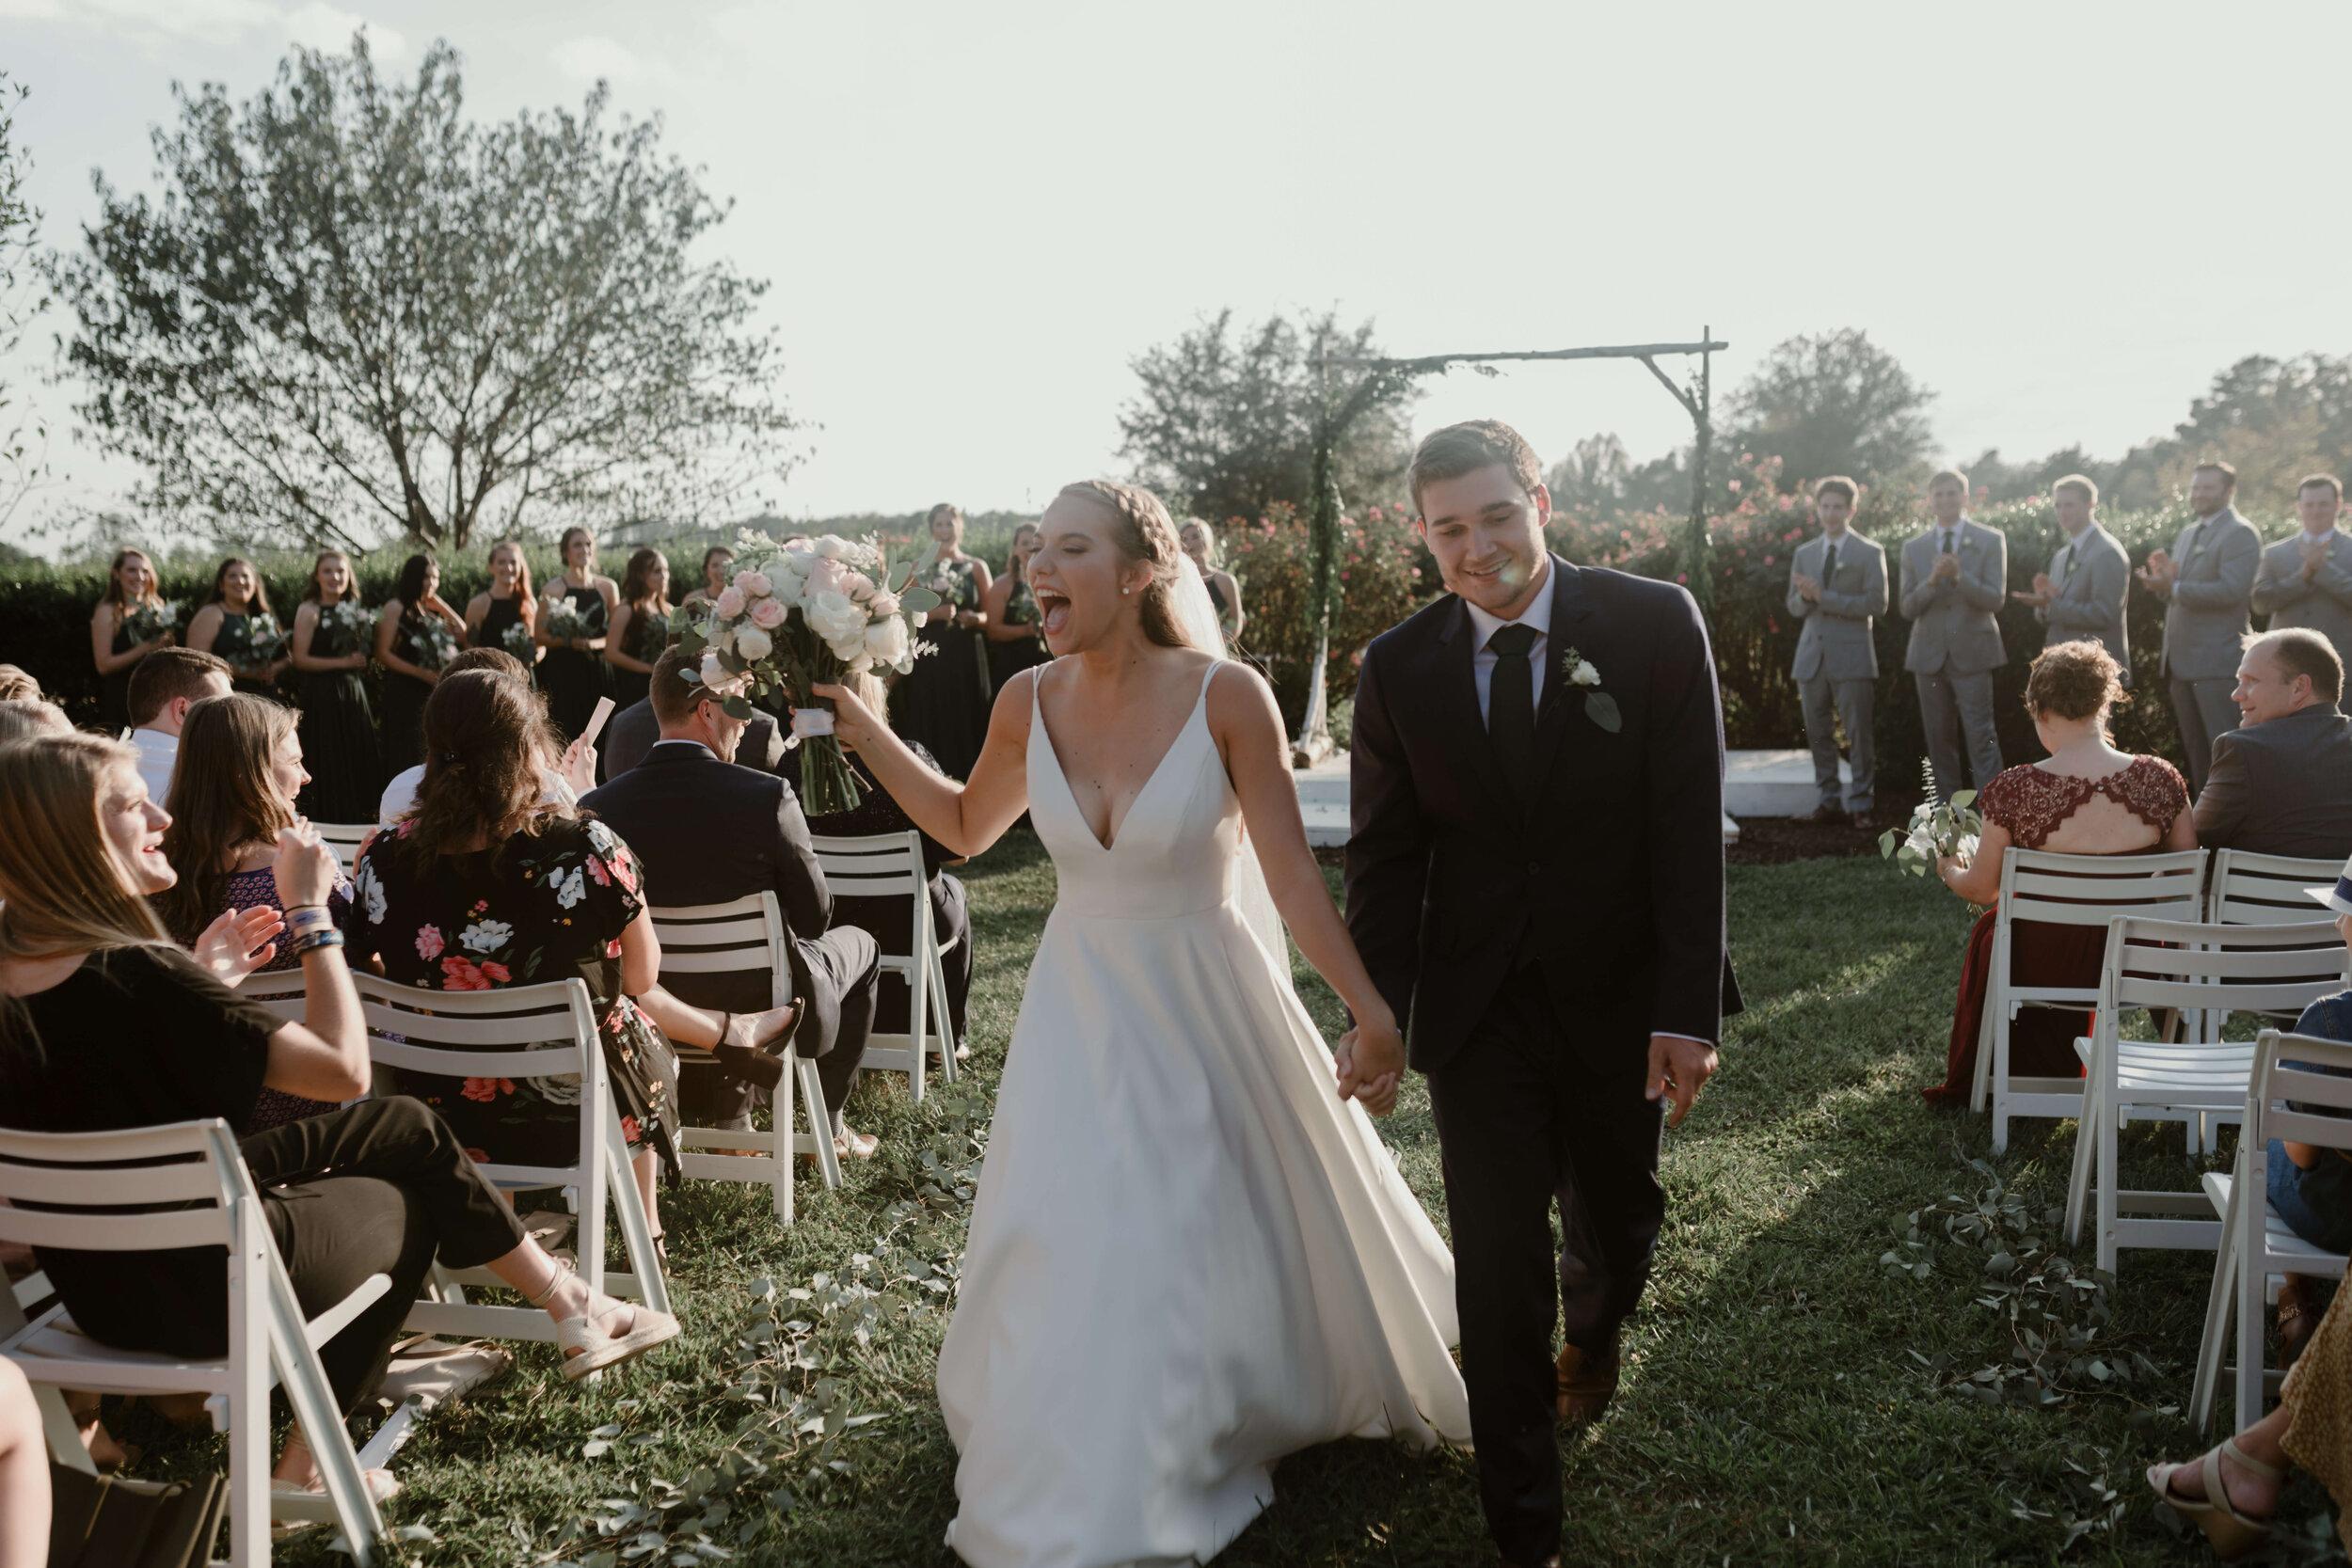 RALEIGH_WEDDING_GABBY_AND_SMITTYDSC_2110.jpg